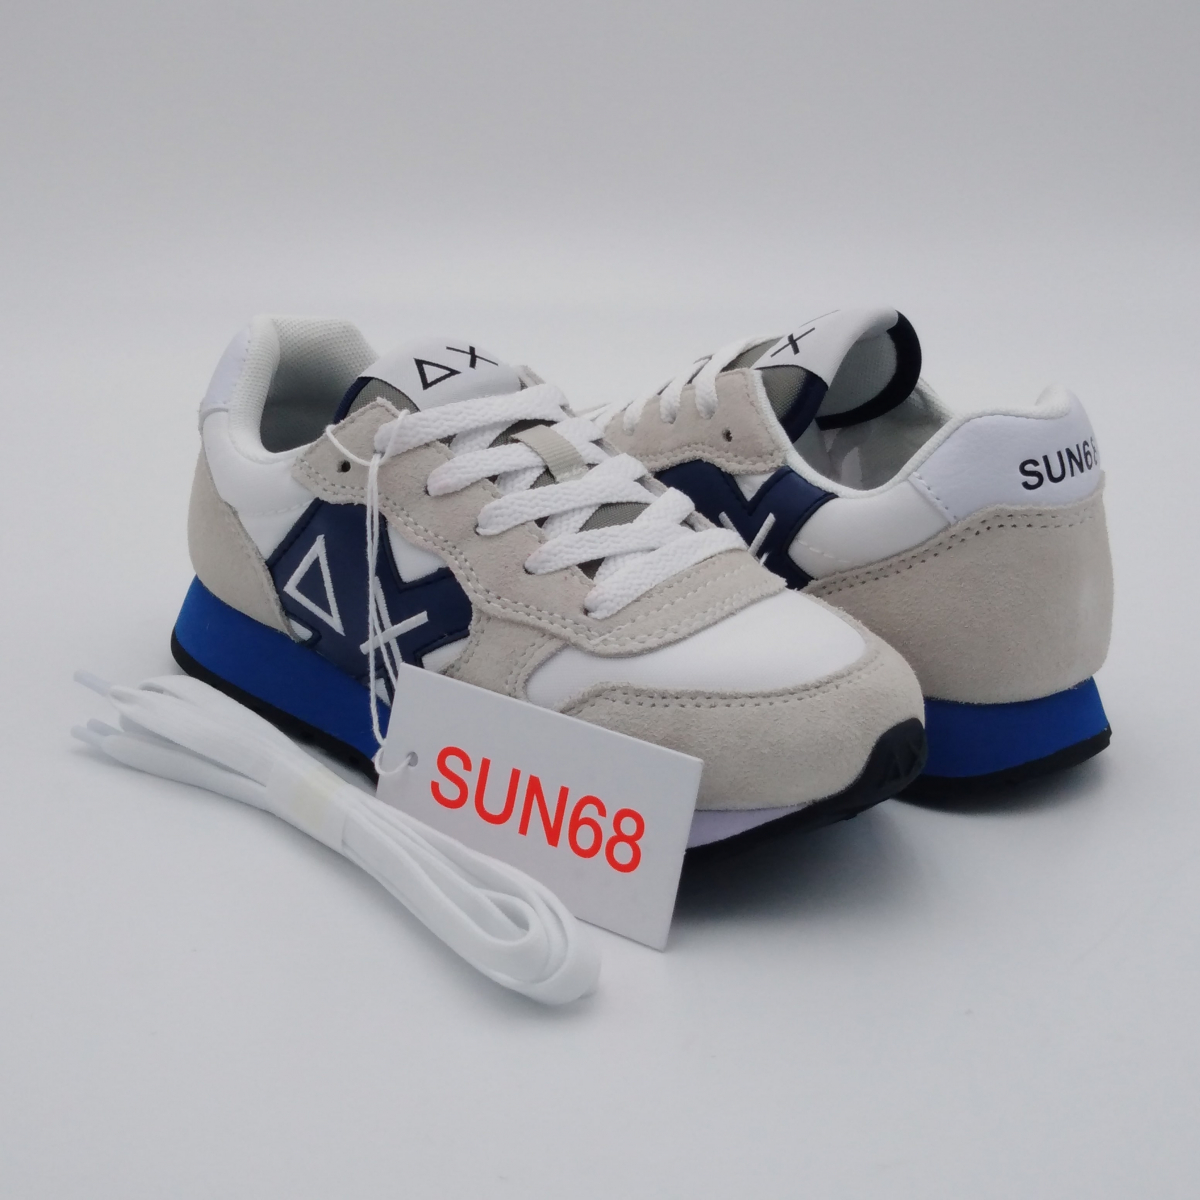 Sun 68 -Sneaker Jaki Nylon...